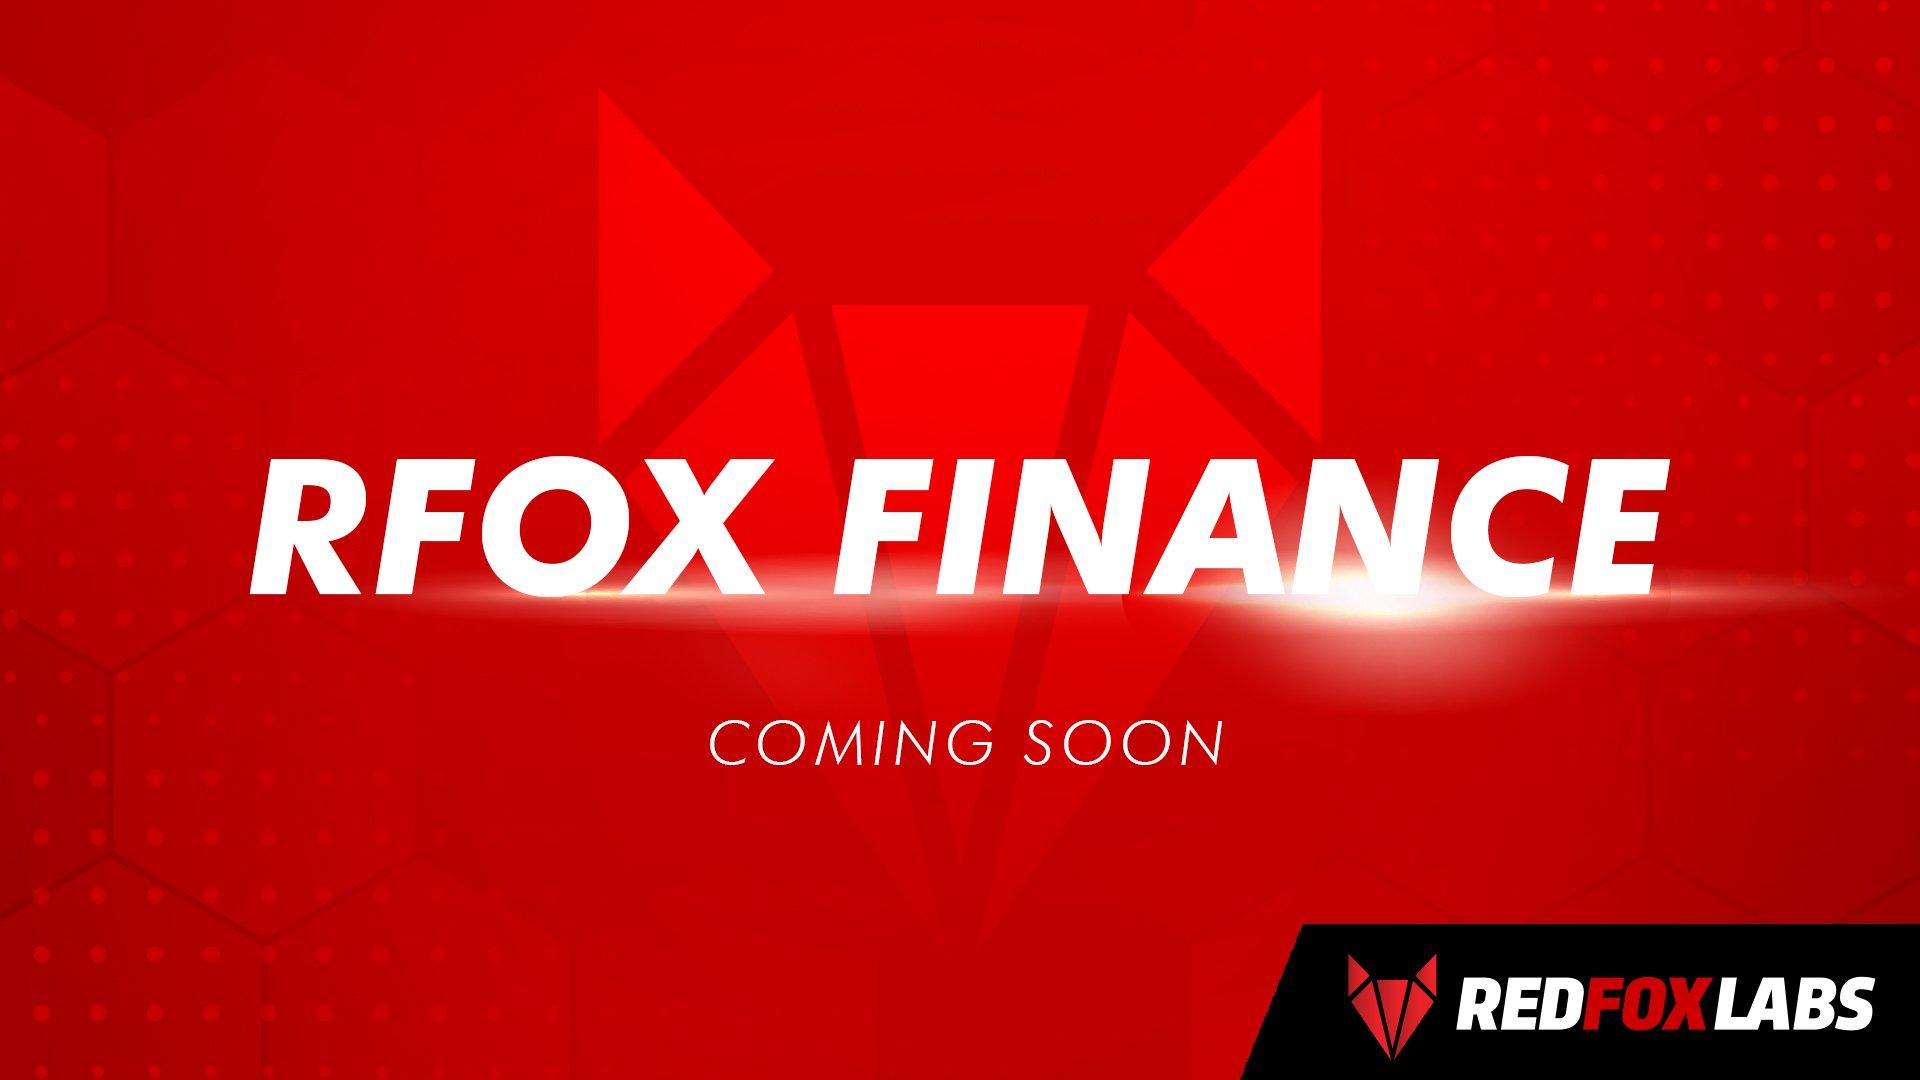 RFOX Finance Brand Announcement